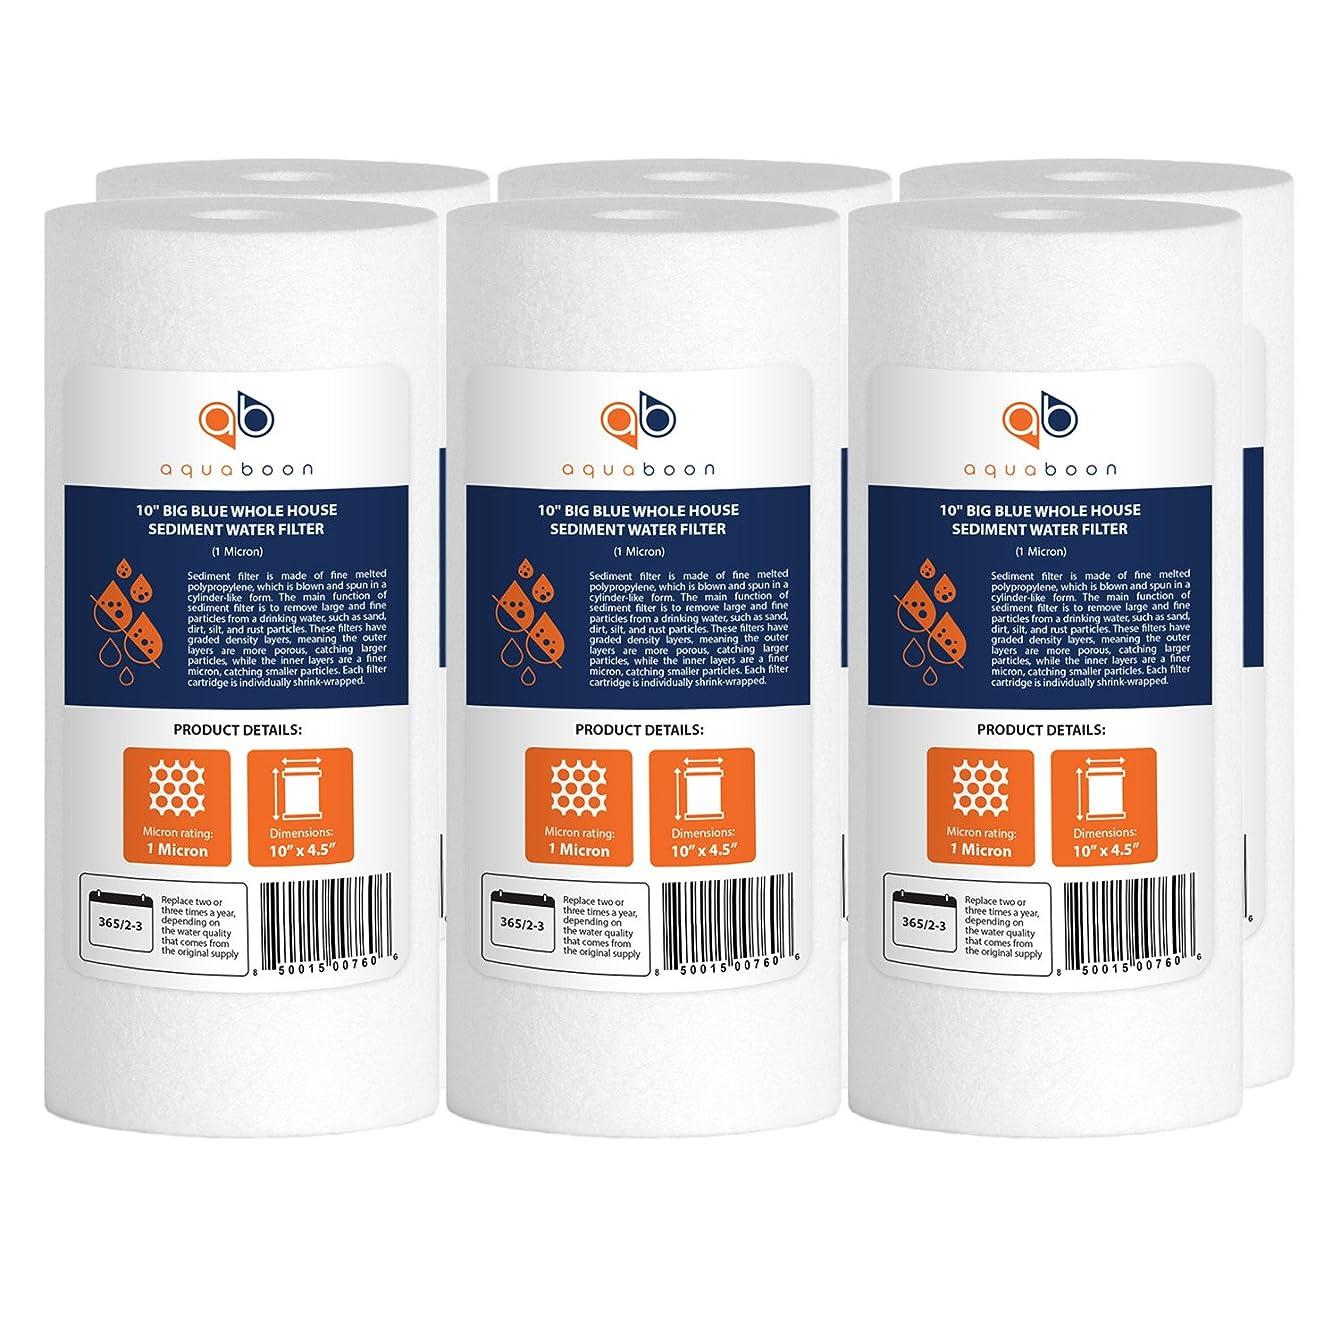 Aquaboon 6-Pack of 1 Micron 10